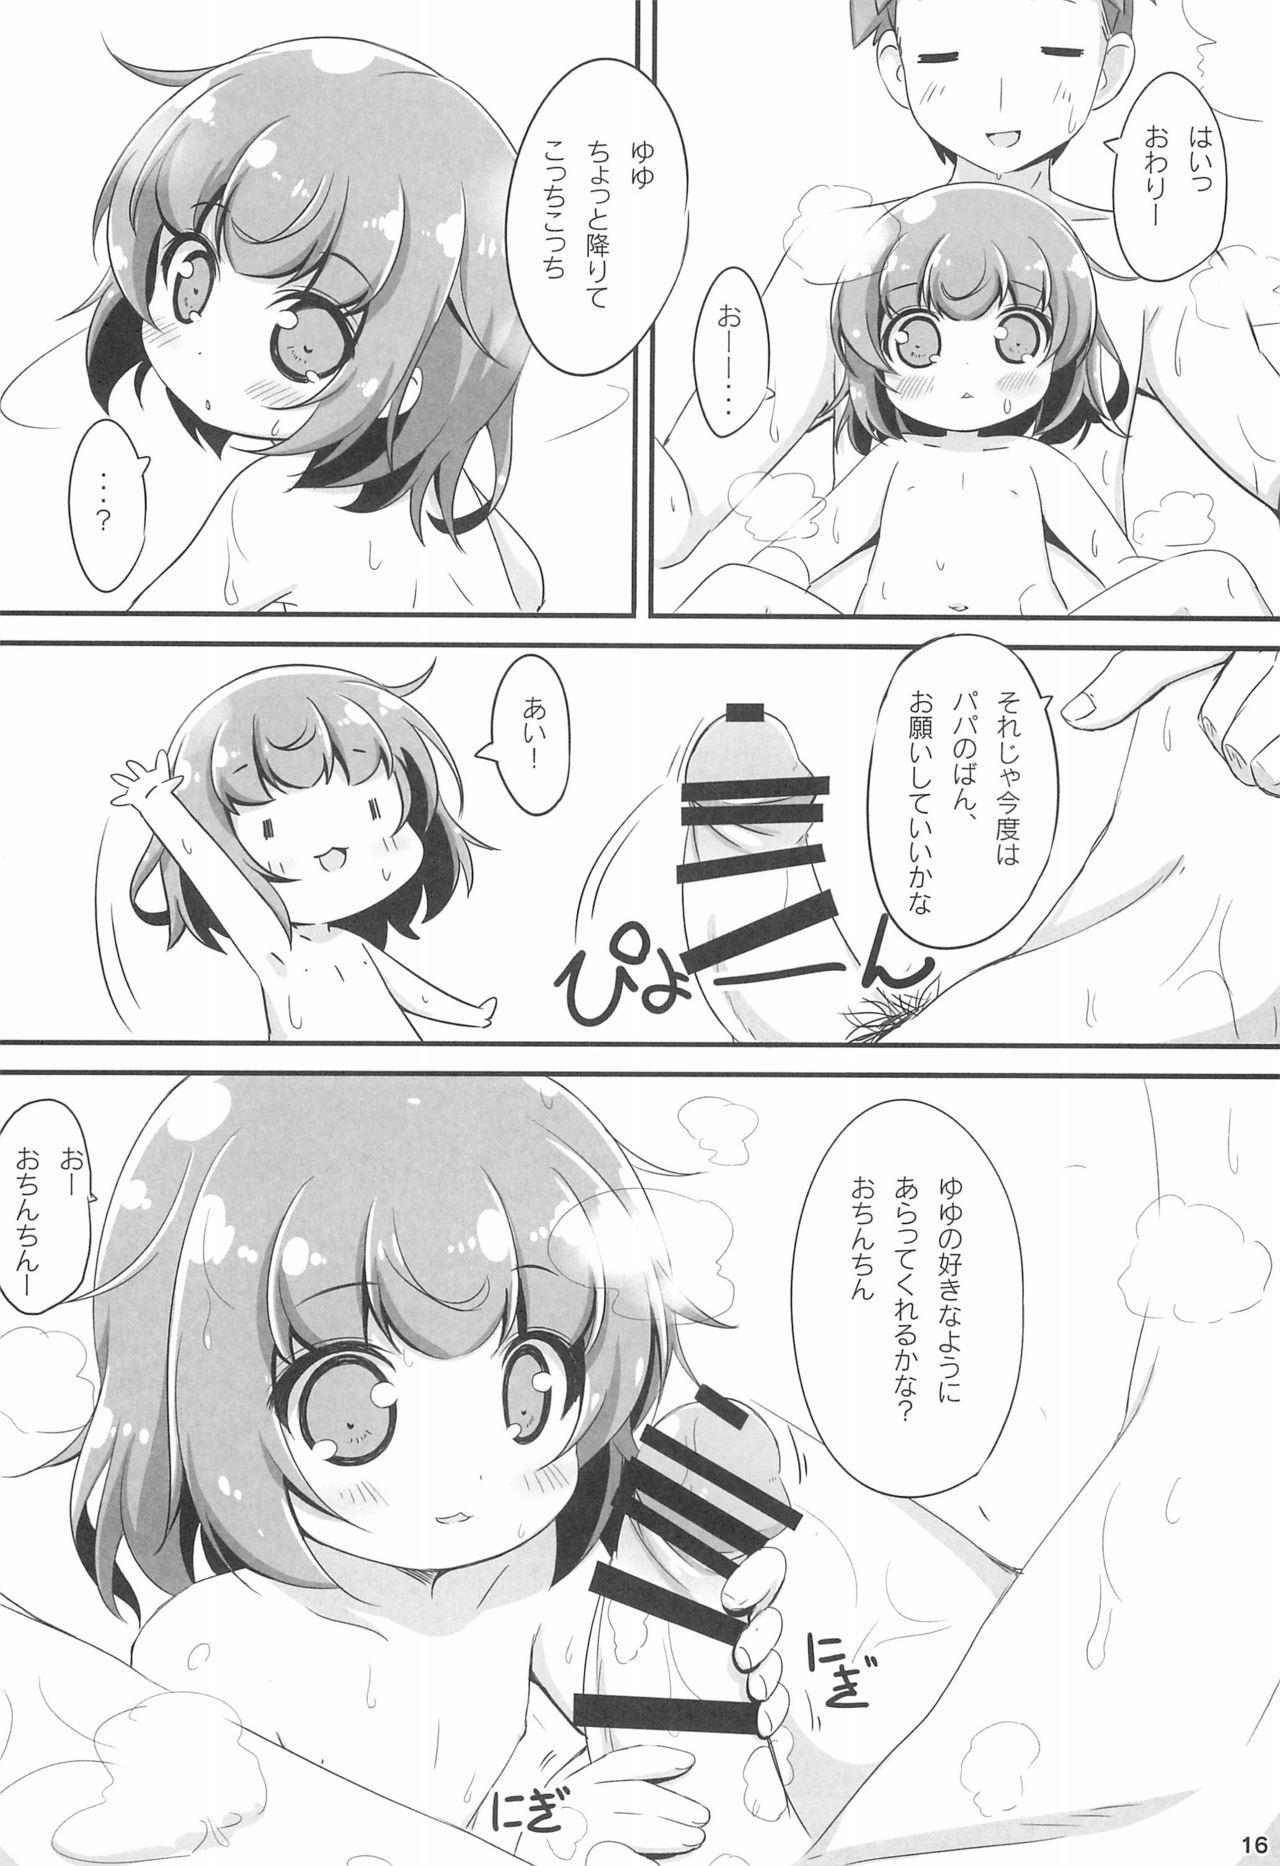 Ofuro ni Hairo *Let's go to the bath* 15